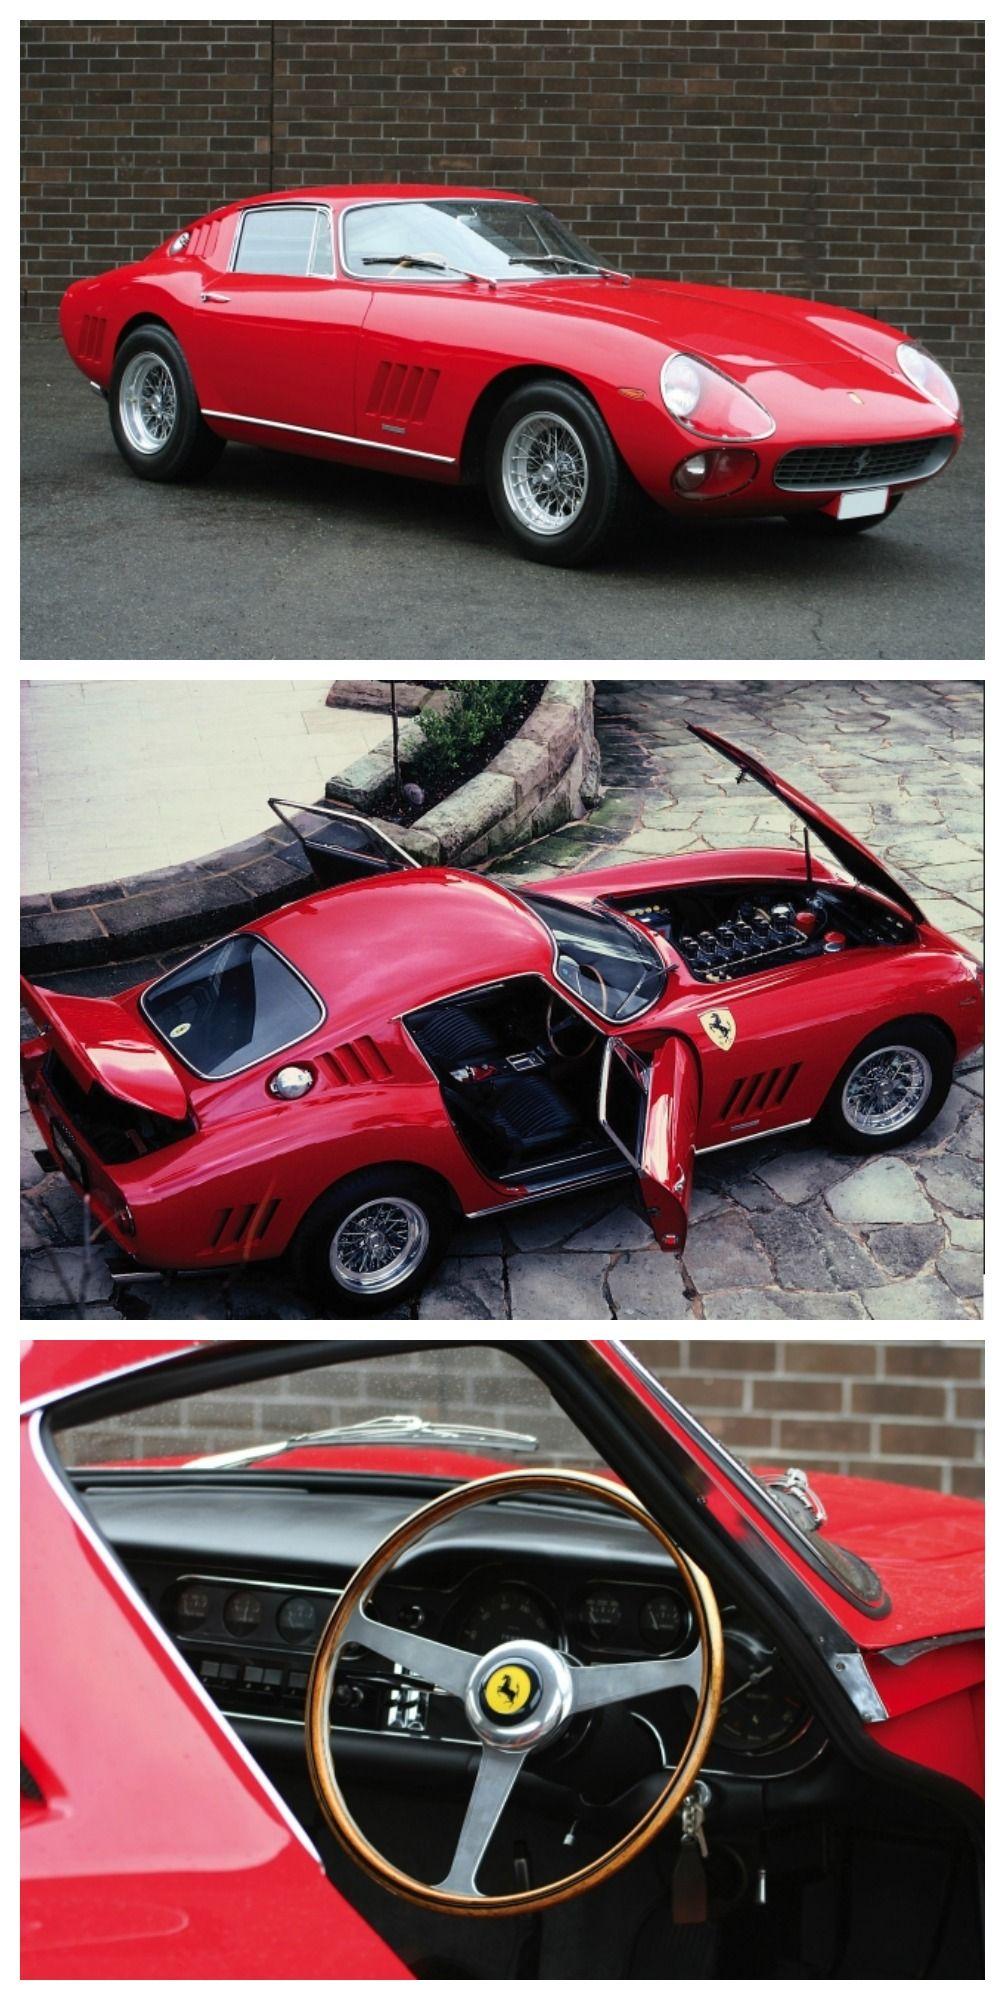 One Of A Kind 2 Million Dollar Ferrari 275 In Unbelievable Condition Throwbackthursday Ferrari Ferrari Car Classic Cars